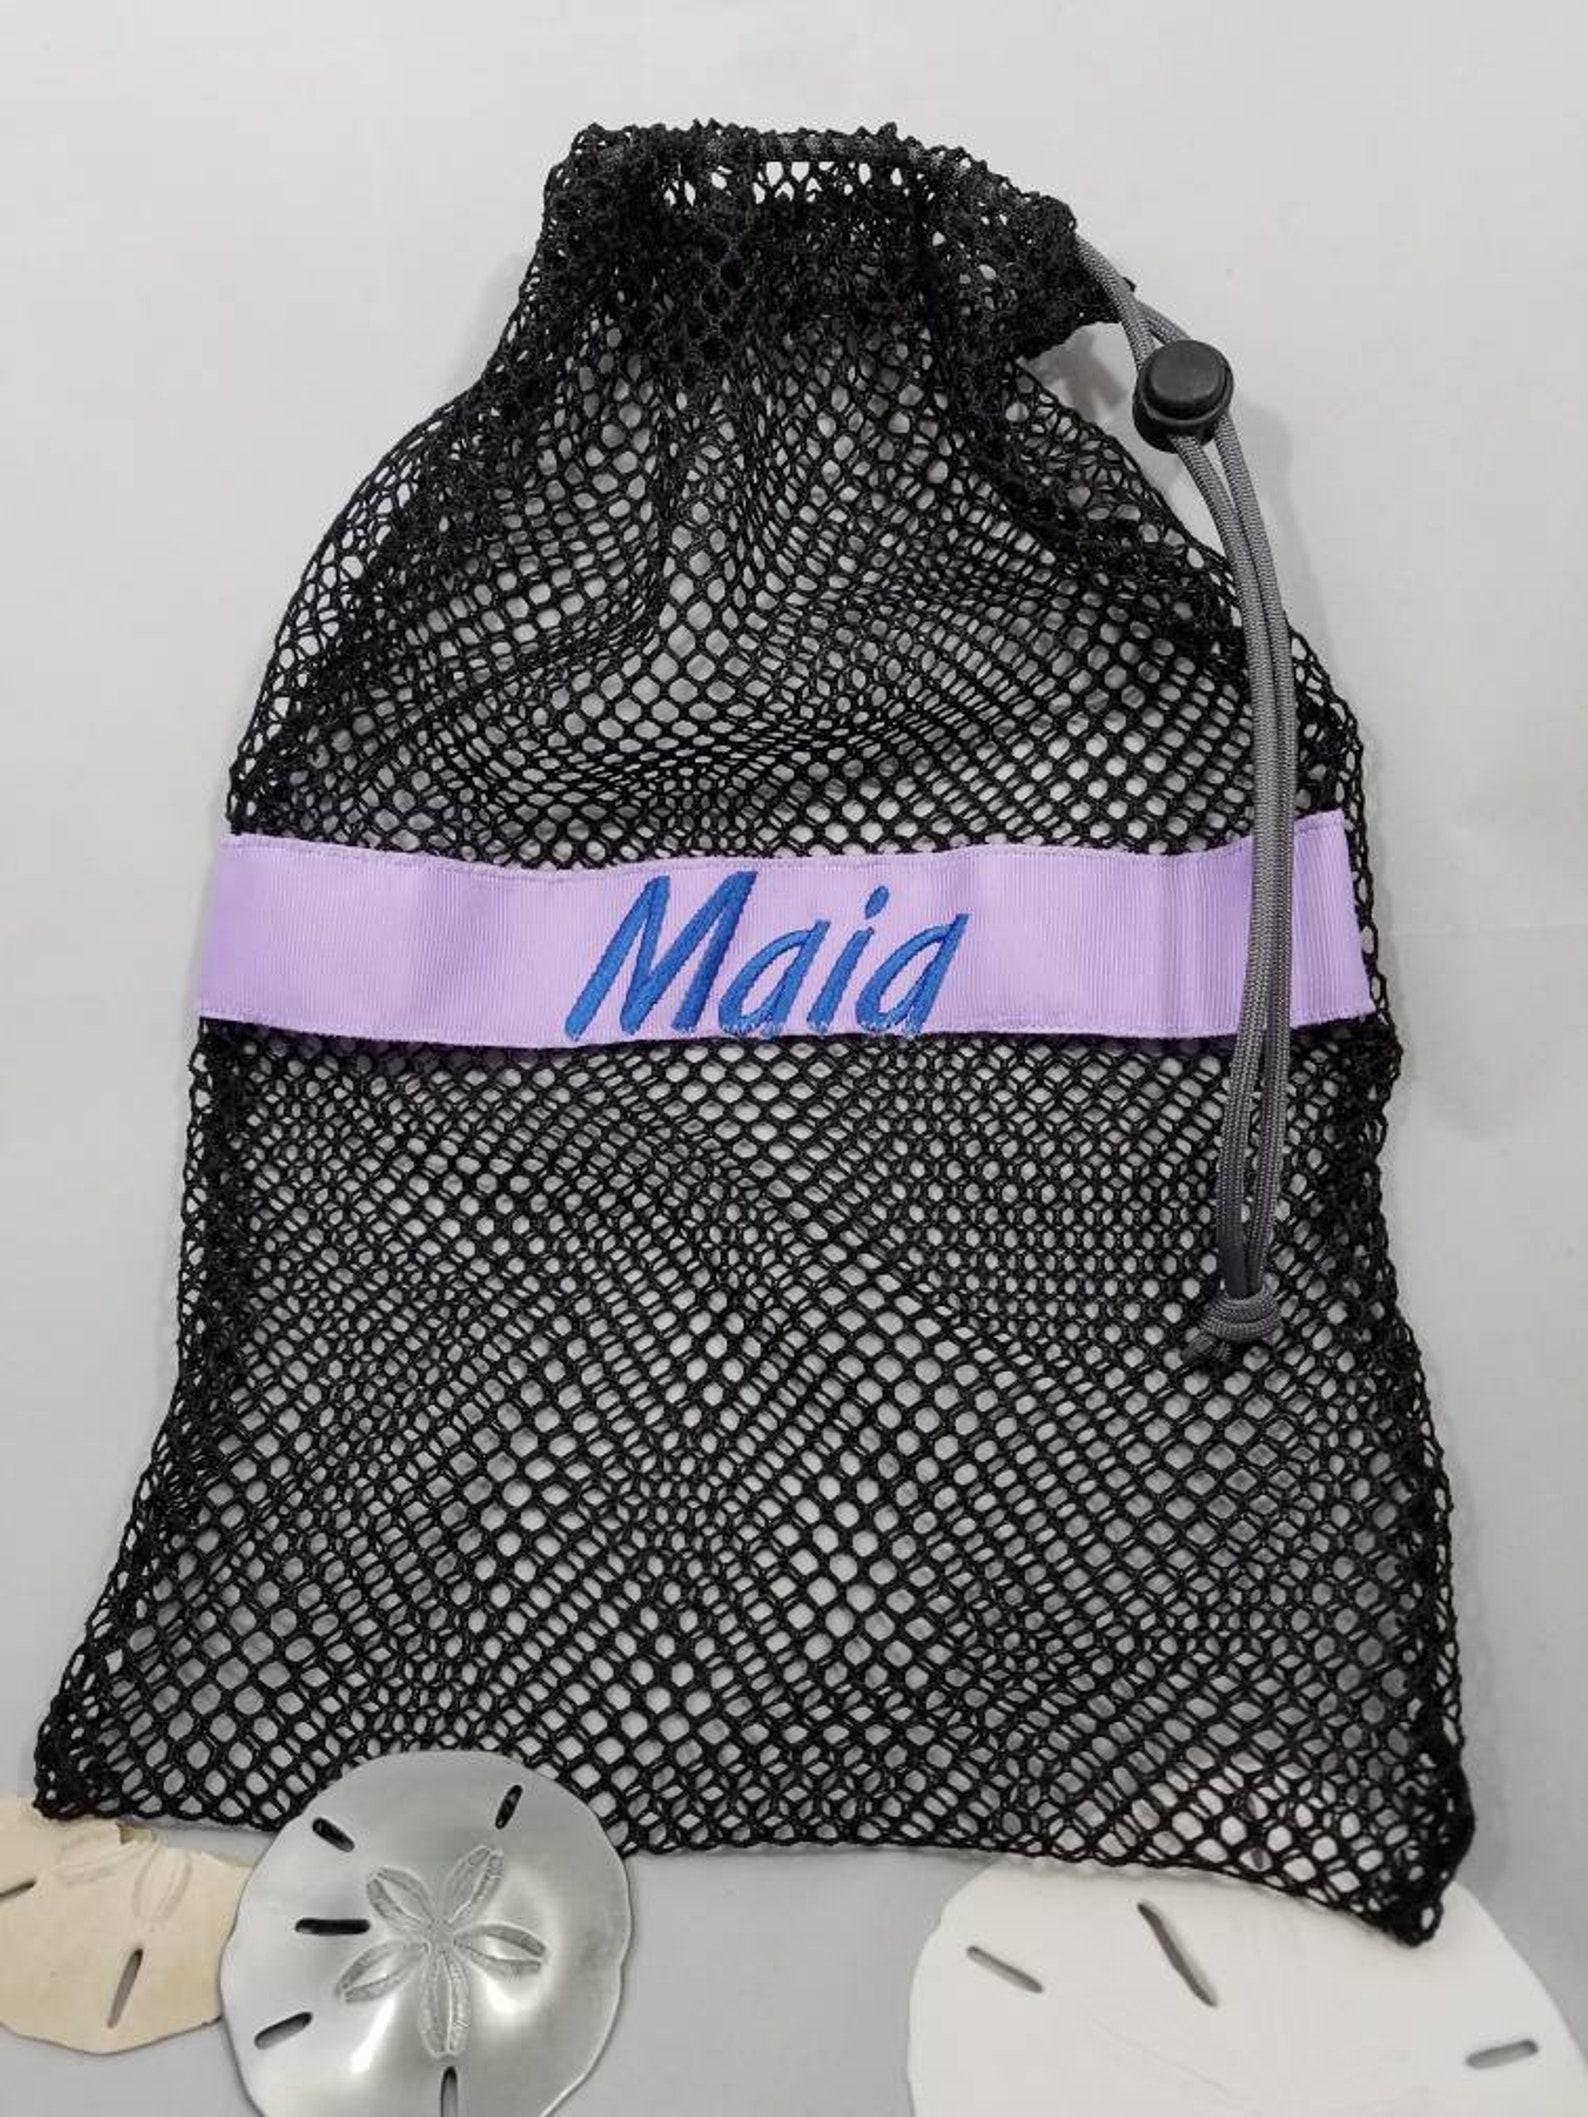 mesh drawstring black large ballet jazz tap pointe shoe glove ditty bag; free shipping within usa; dance team cheer softball gif